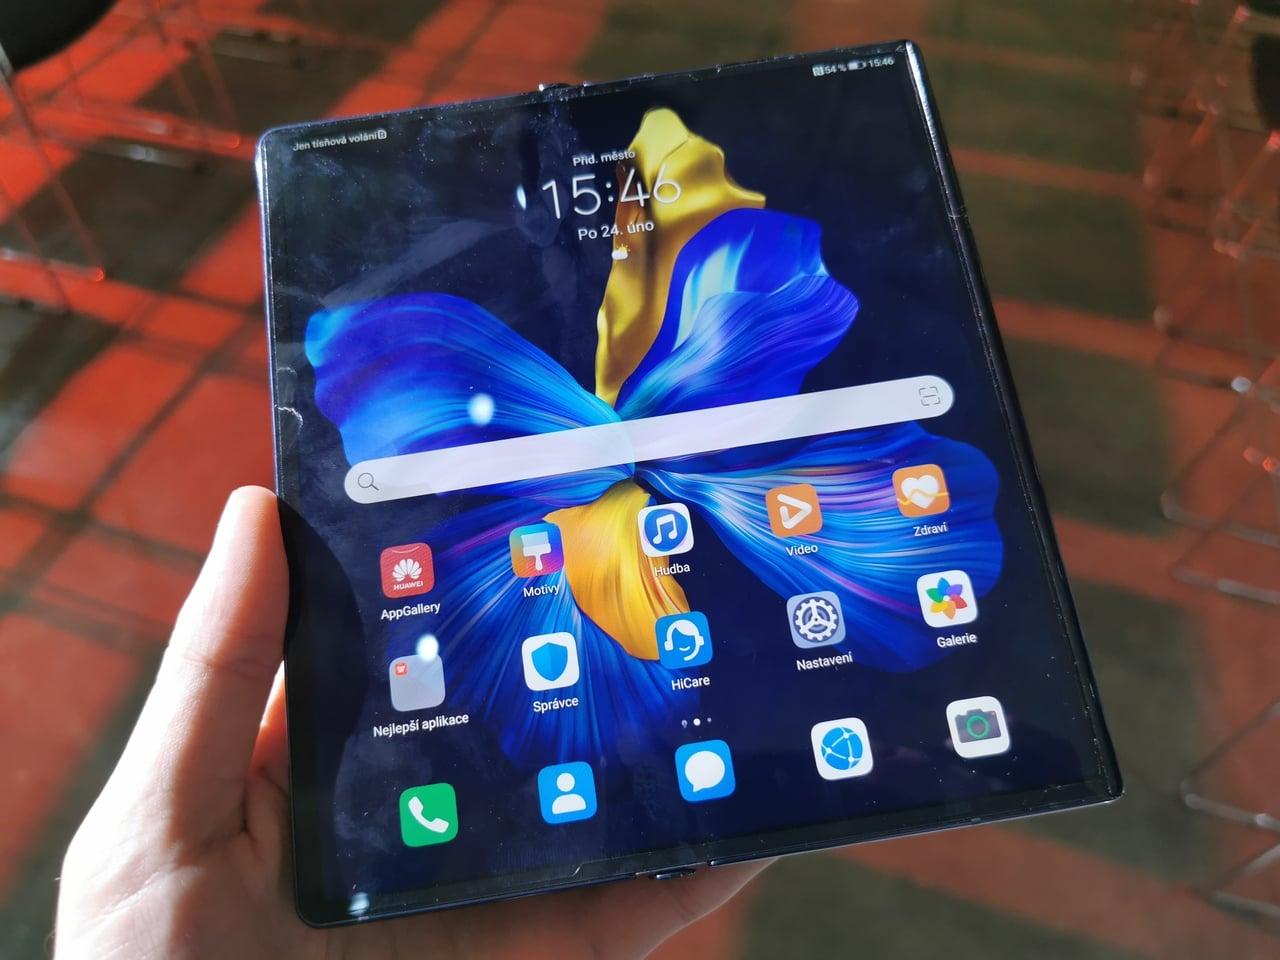 Ohebný chytrý telefon Huawei Mate Xs